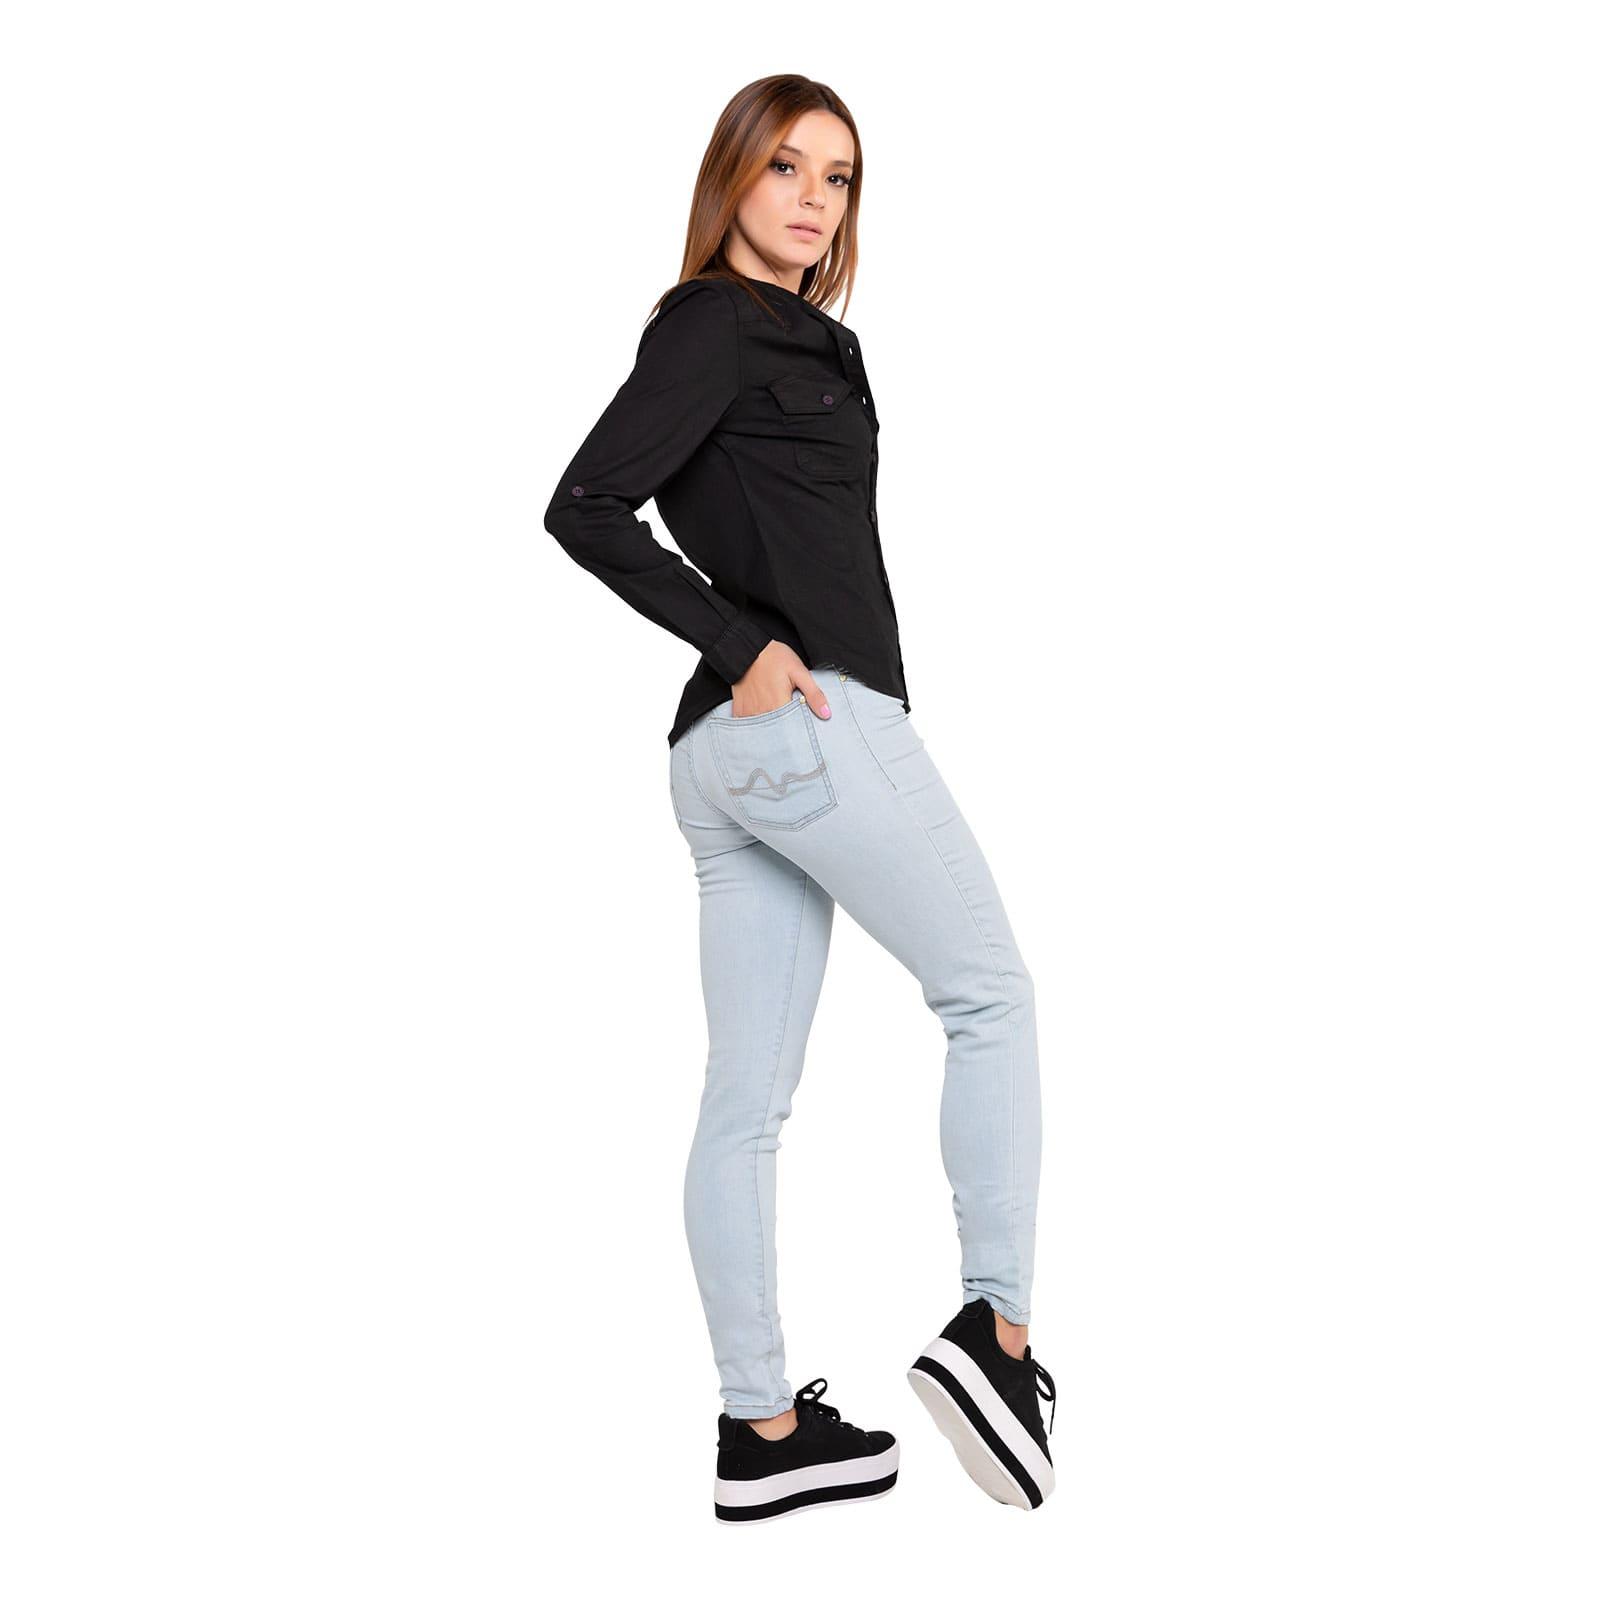 Calça Jeans Feminina Tradicional Skinny